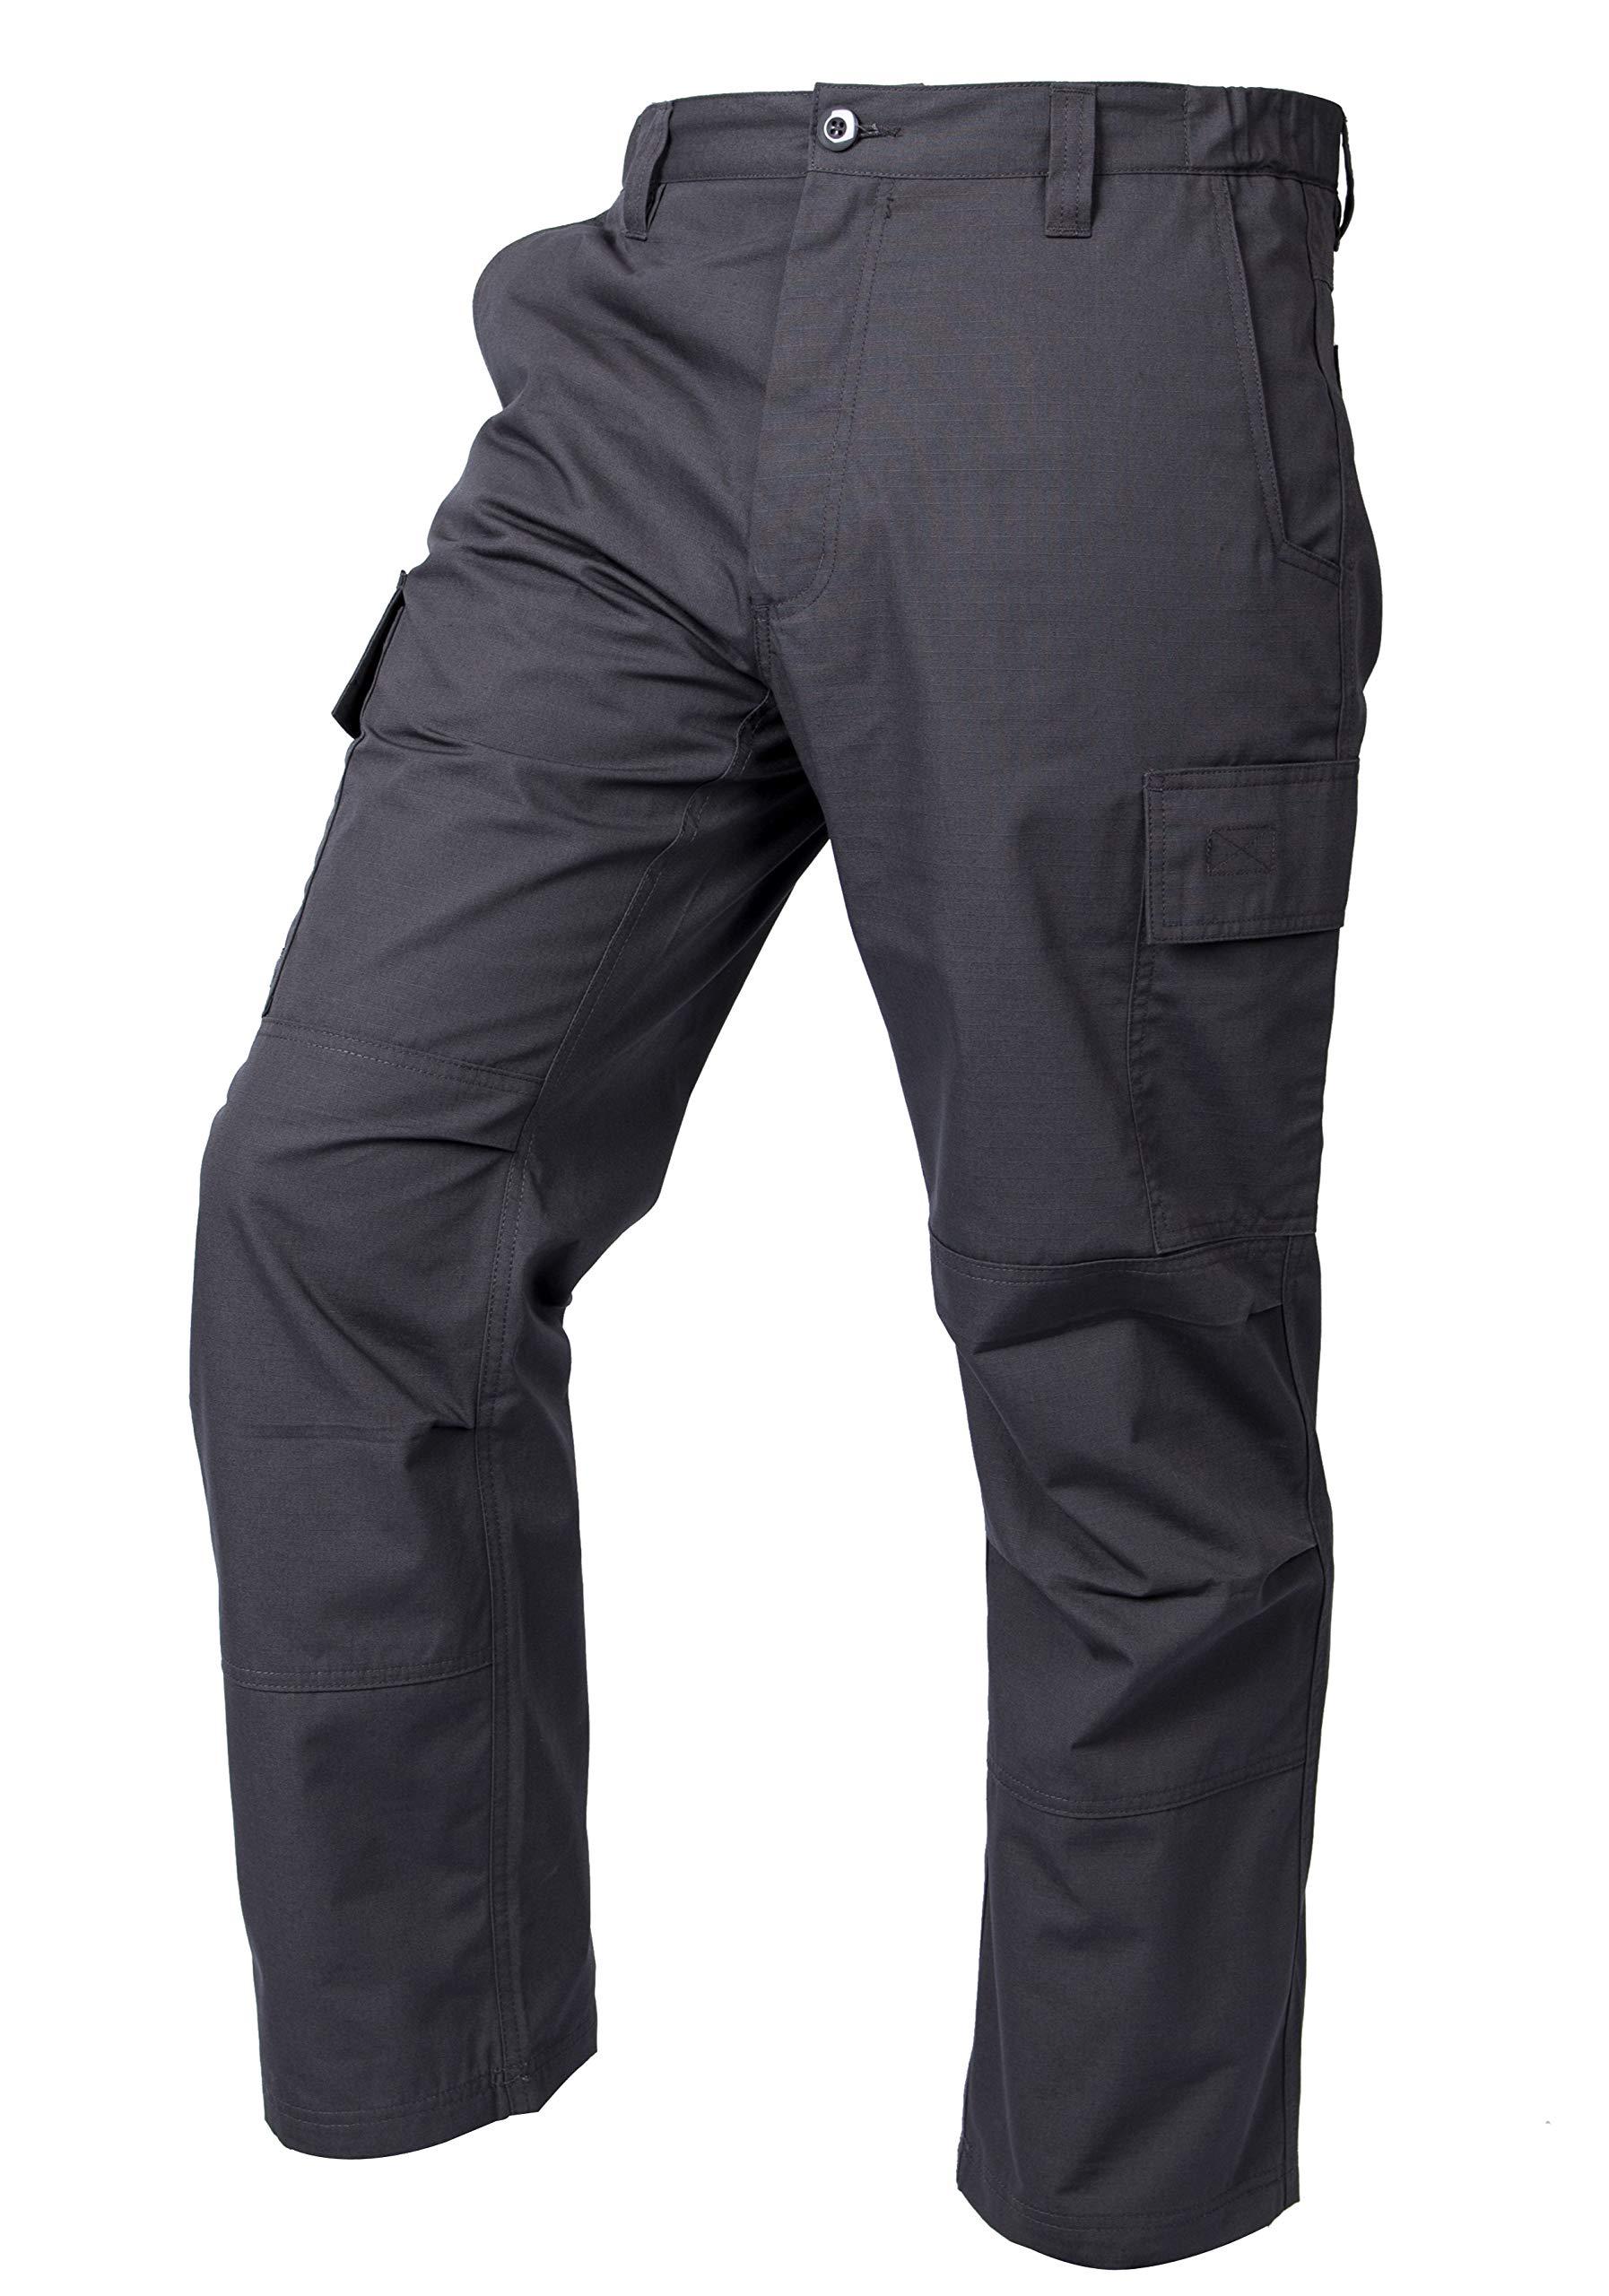 LA Police Gear Mens Core Cargo Lightweight Work Pant - Charcoal - 40 X 32